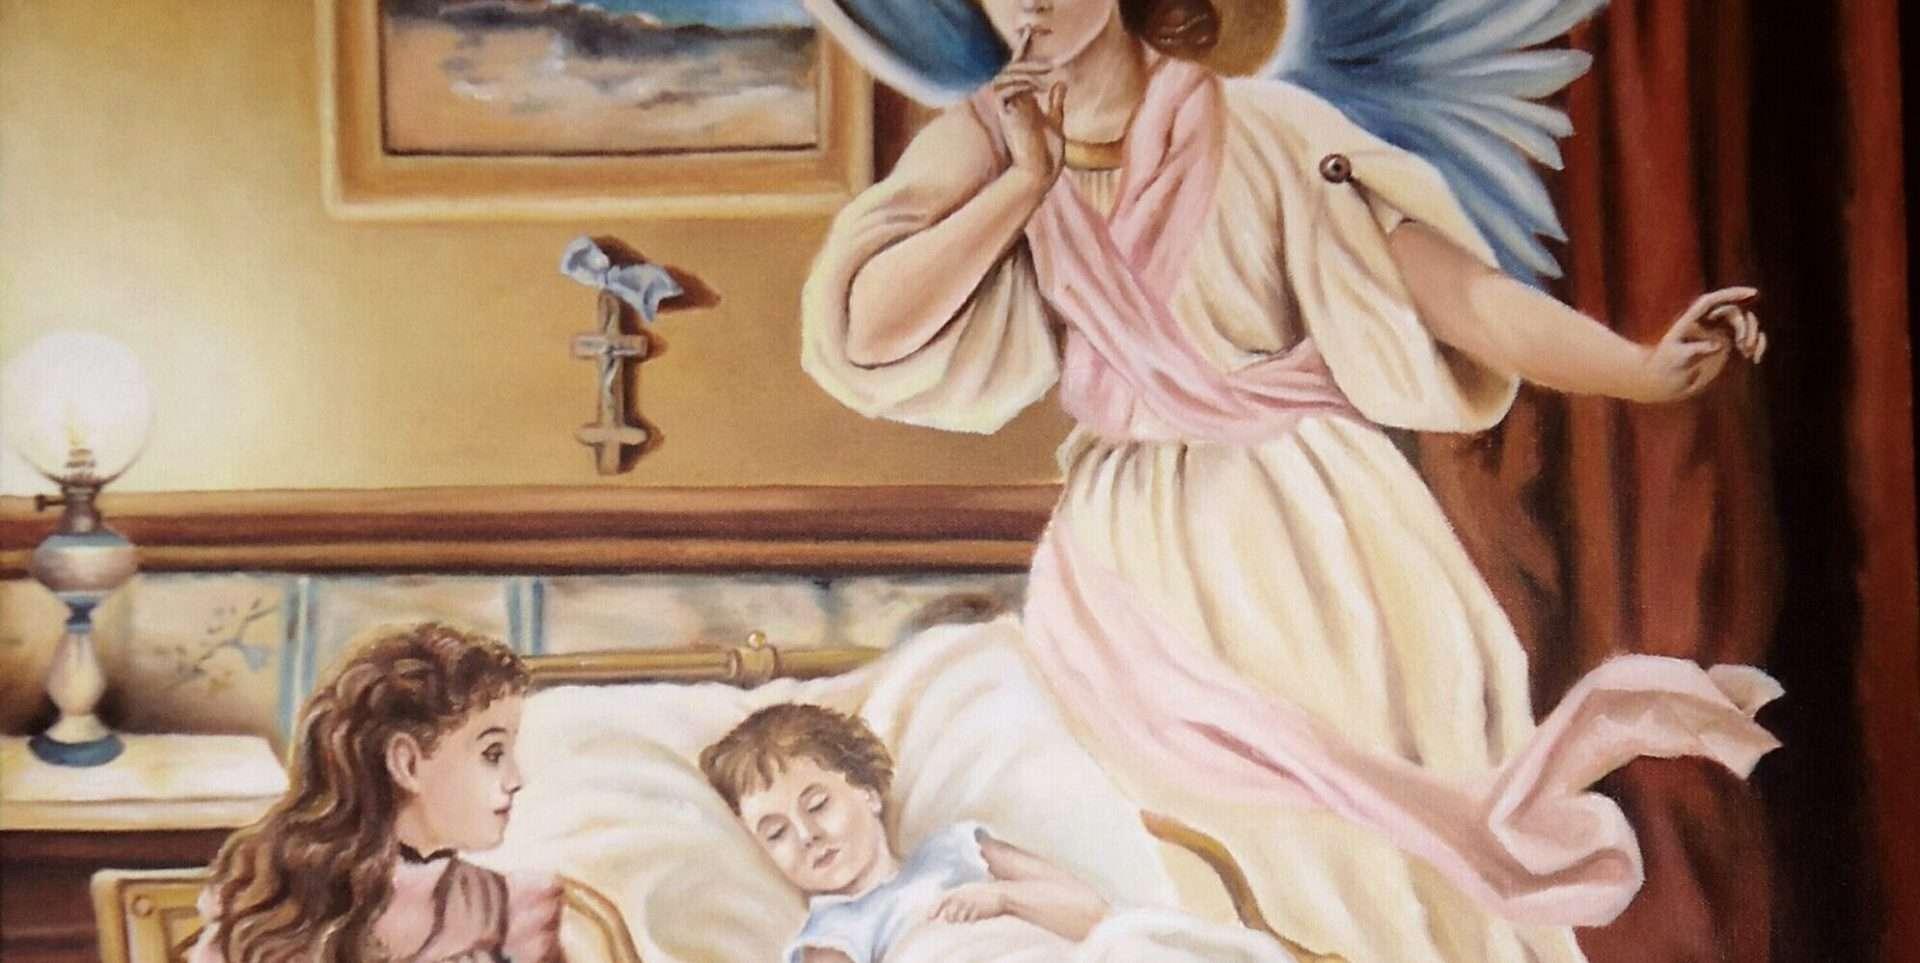 Say this prayer for peaceful night sleep